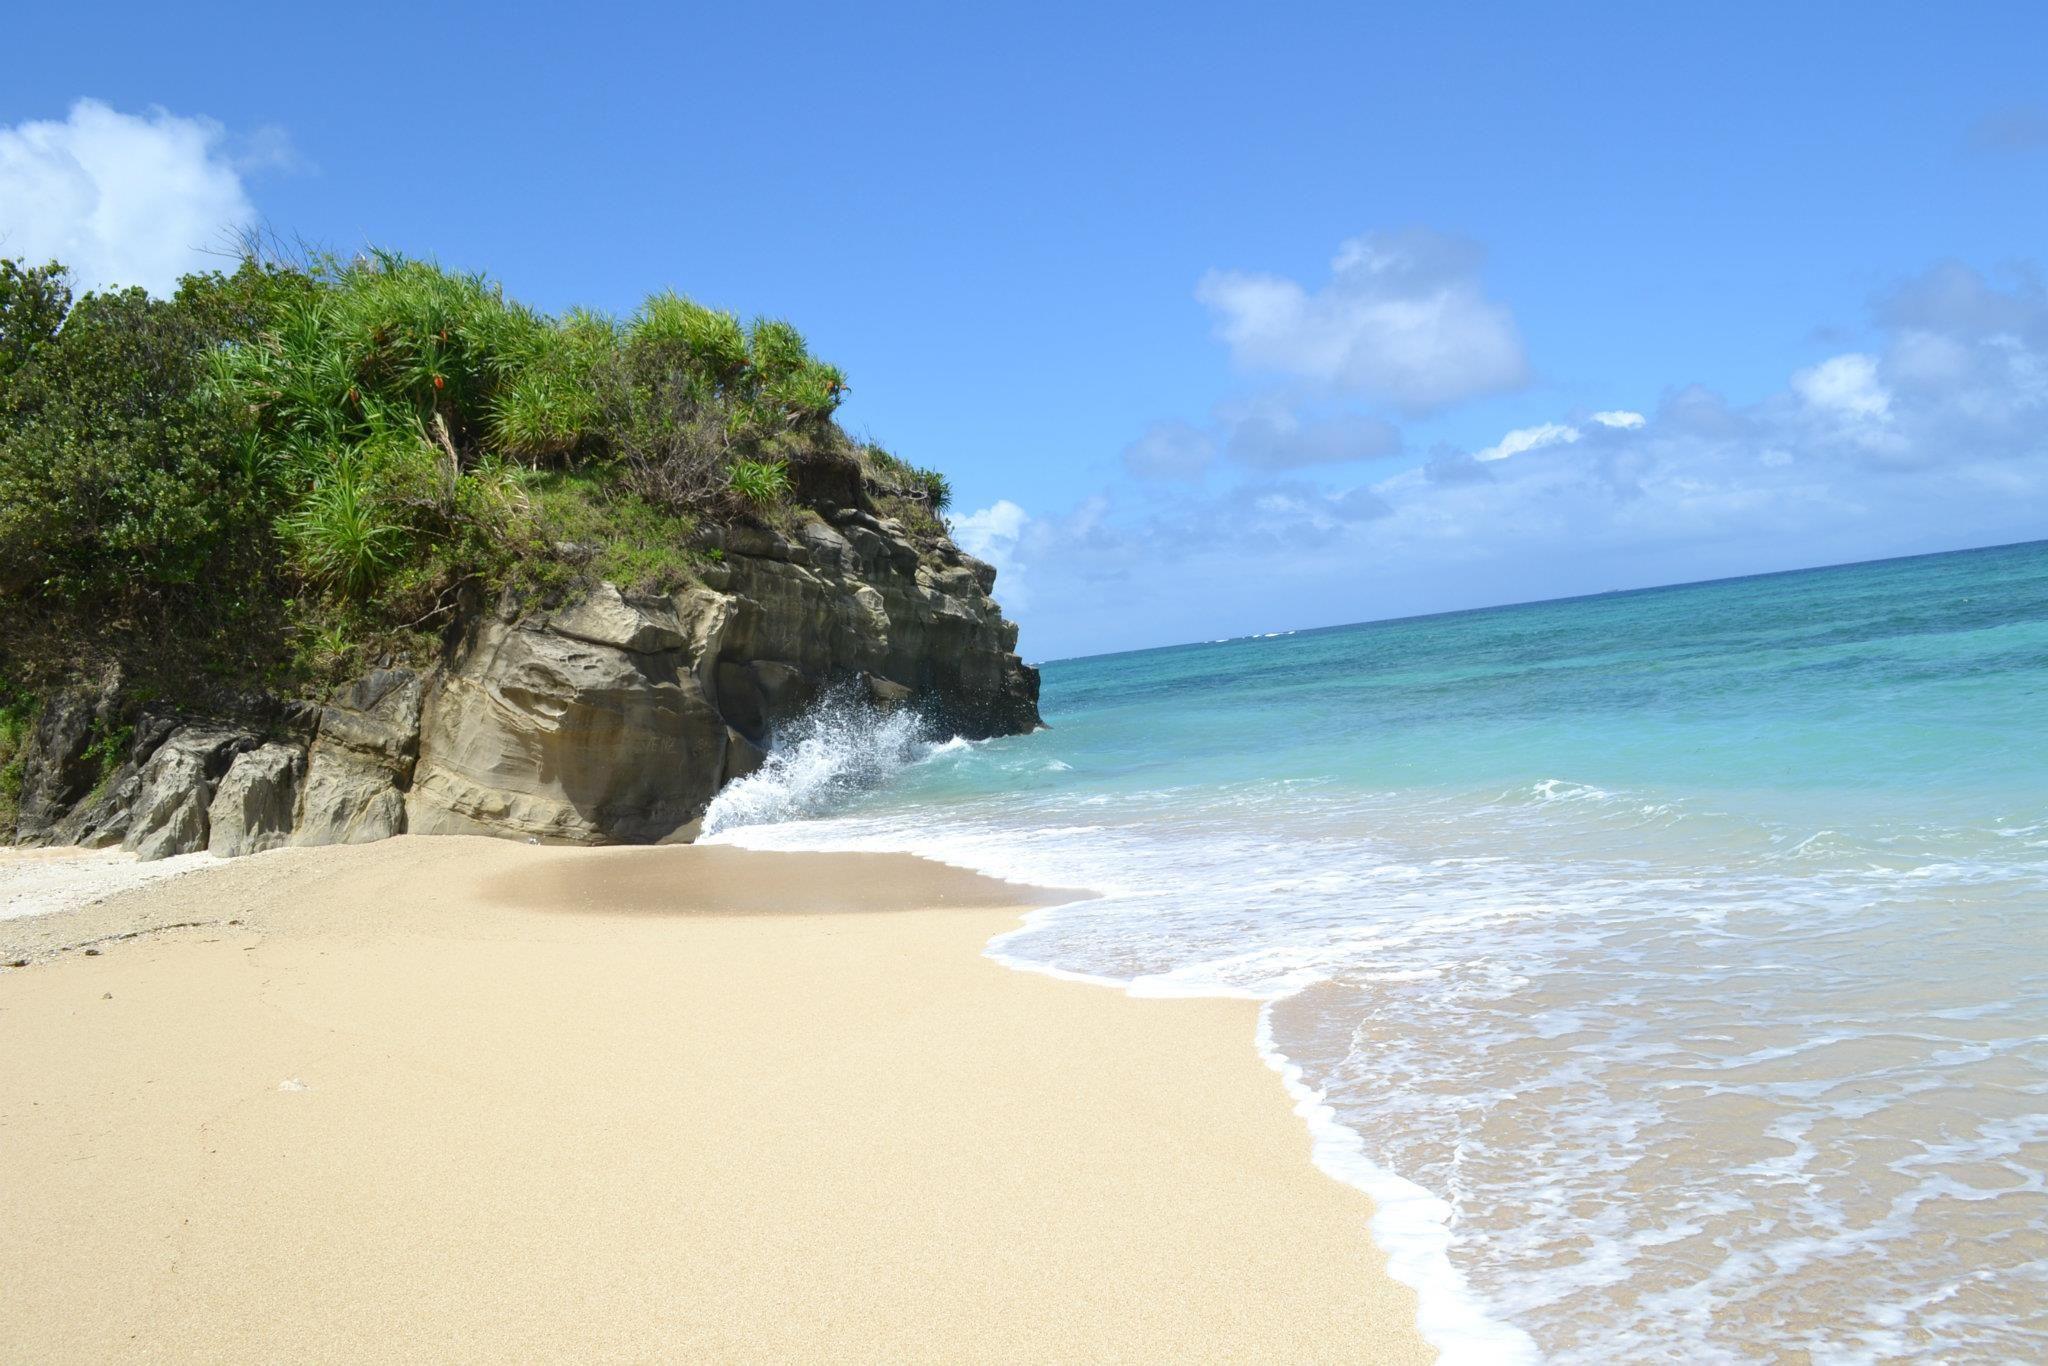 Busdac Beach Pinamuntugan Island In Bacacay Albay Photo By Ryan Baliza It 39 S More Fun In